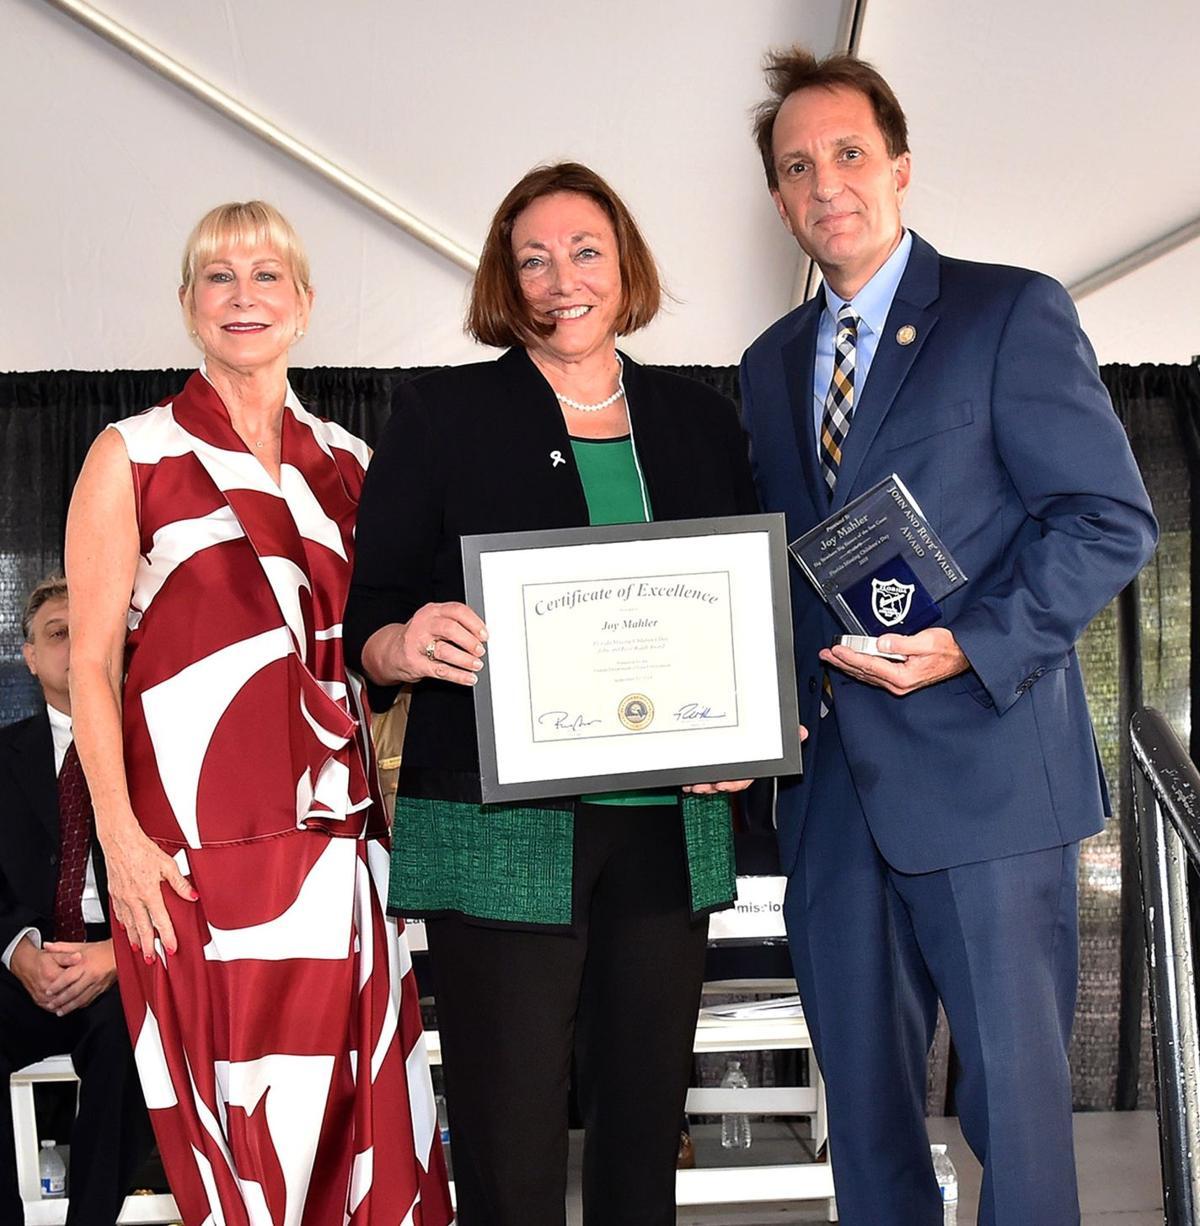 Joy Mahler receives Walsh award